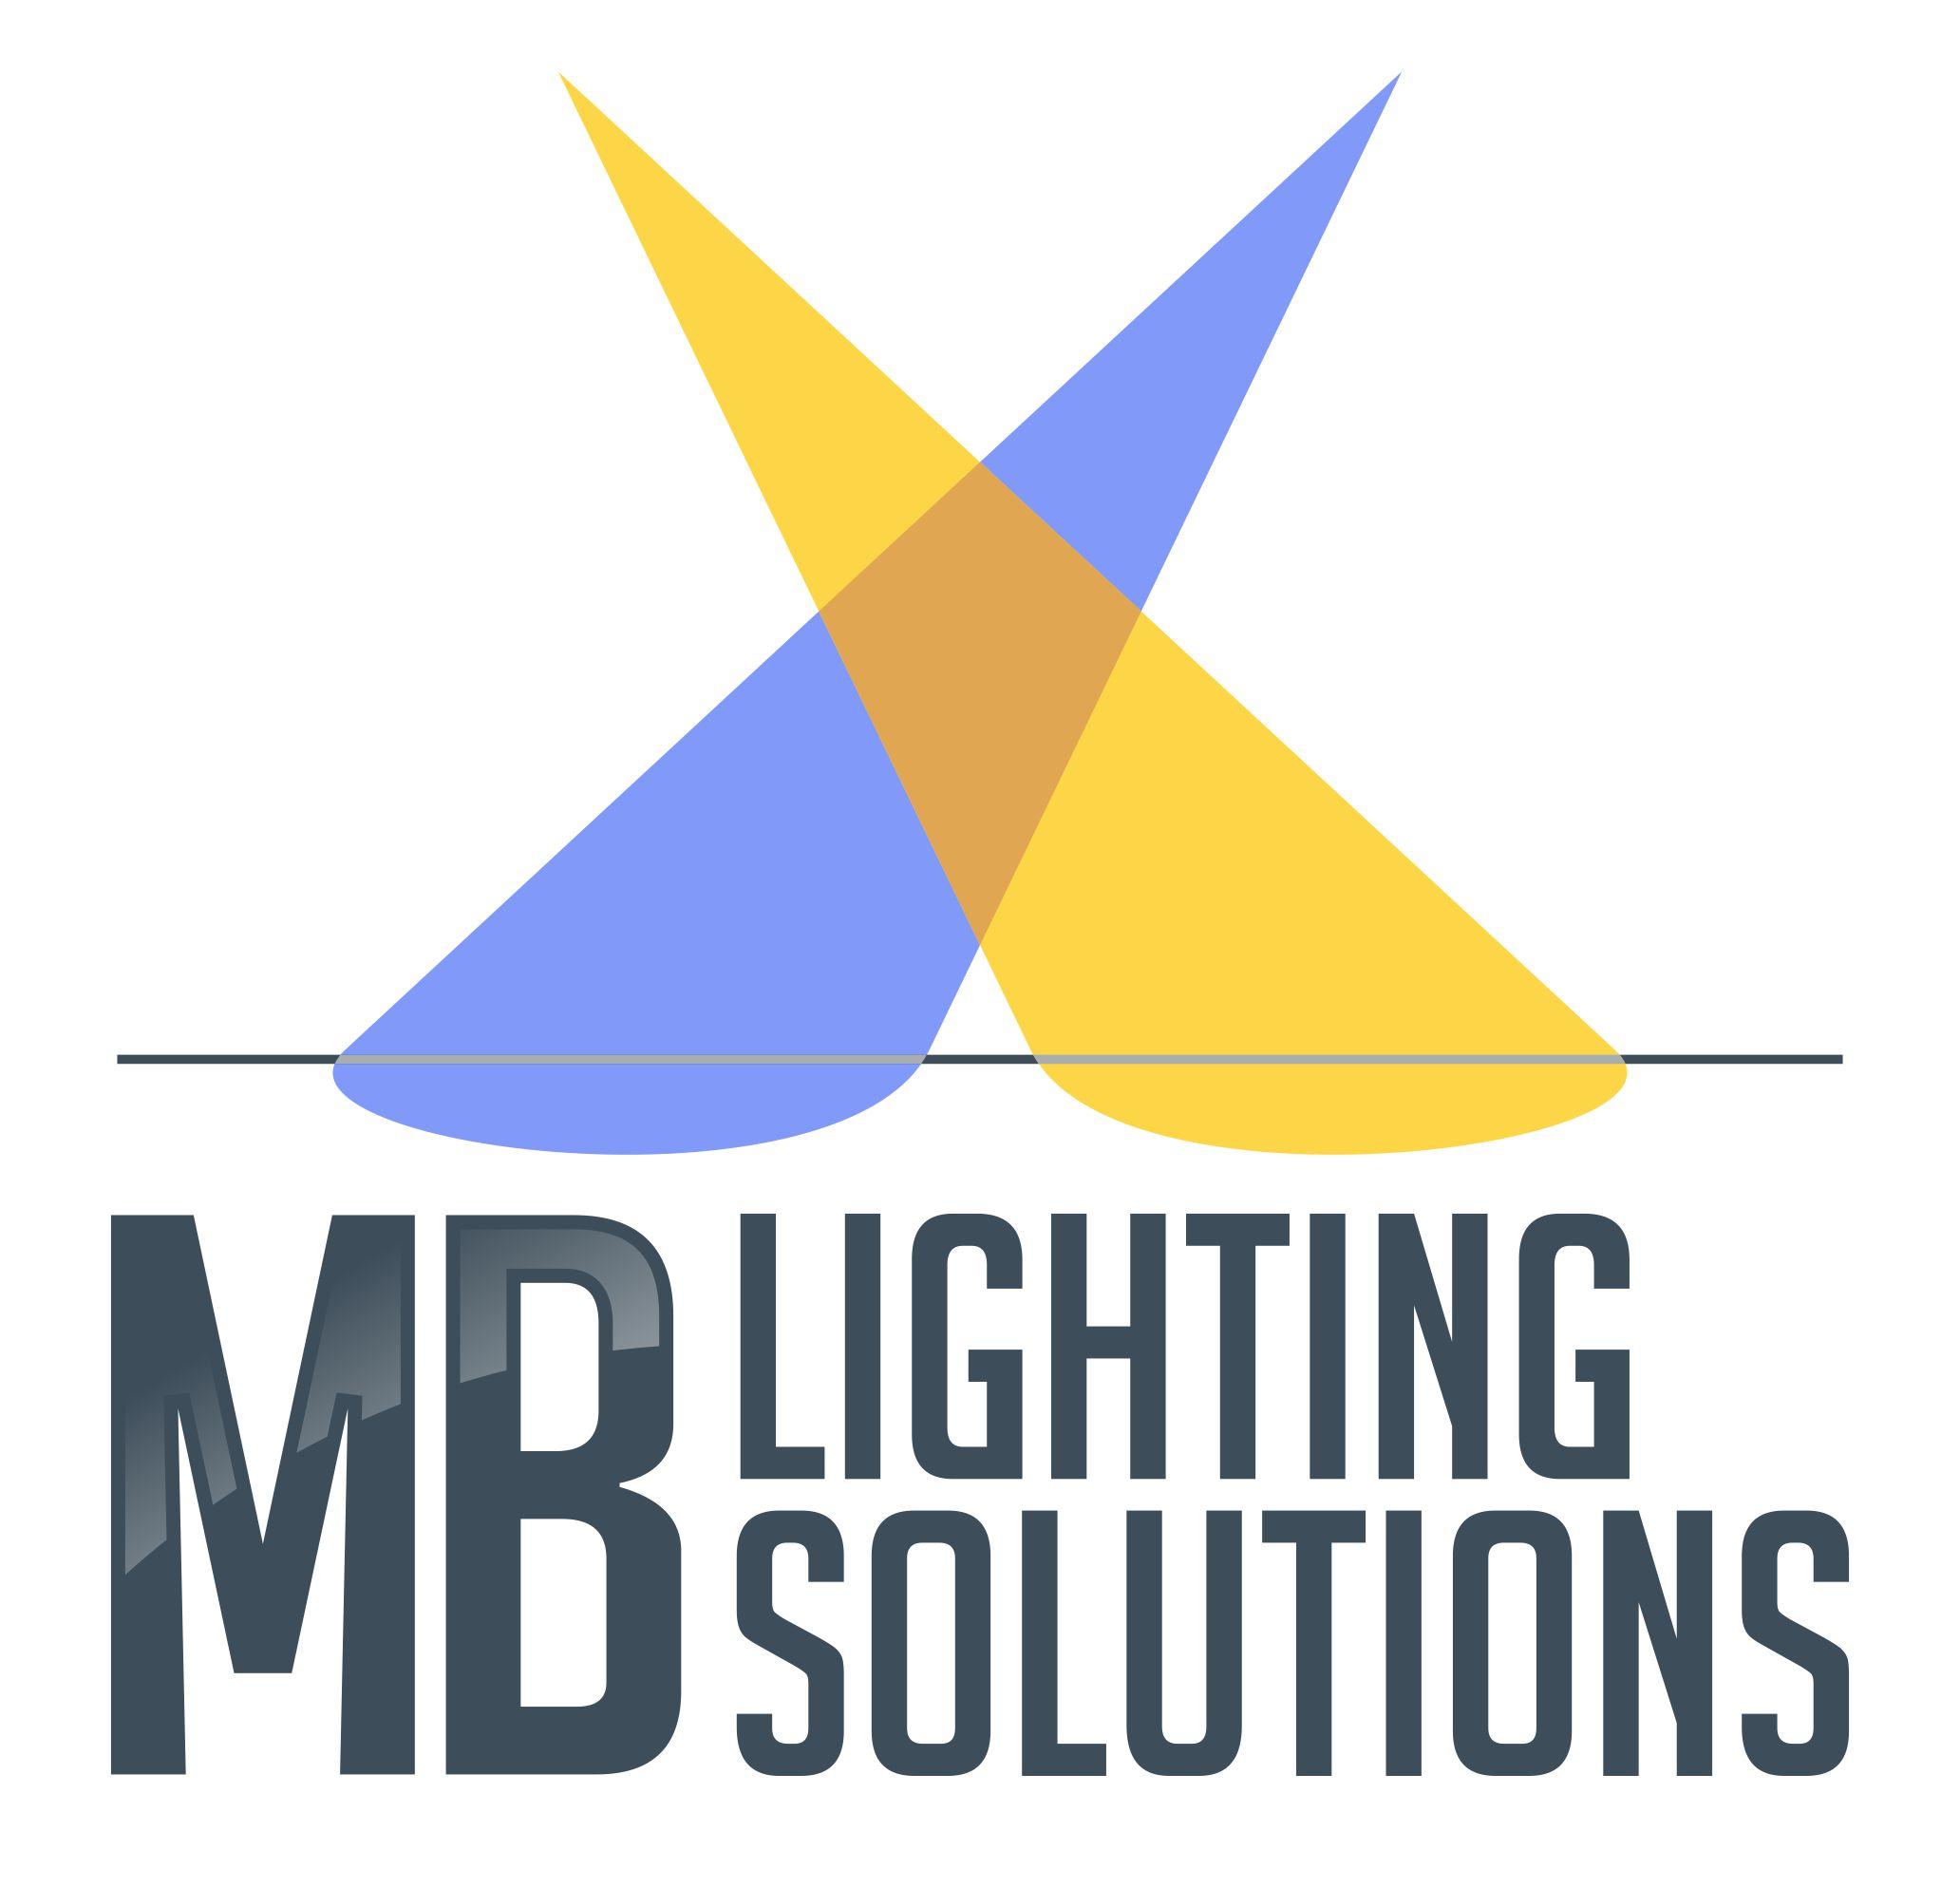 Mb Lighting Solutions